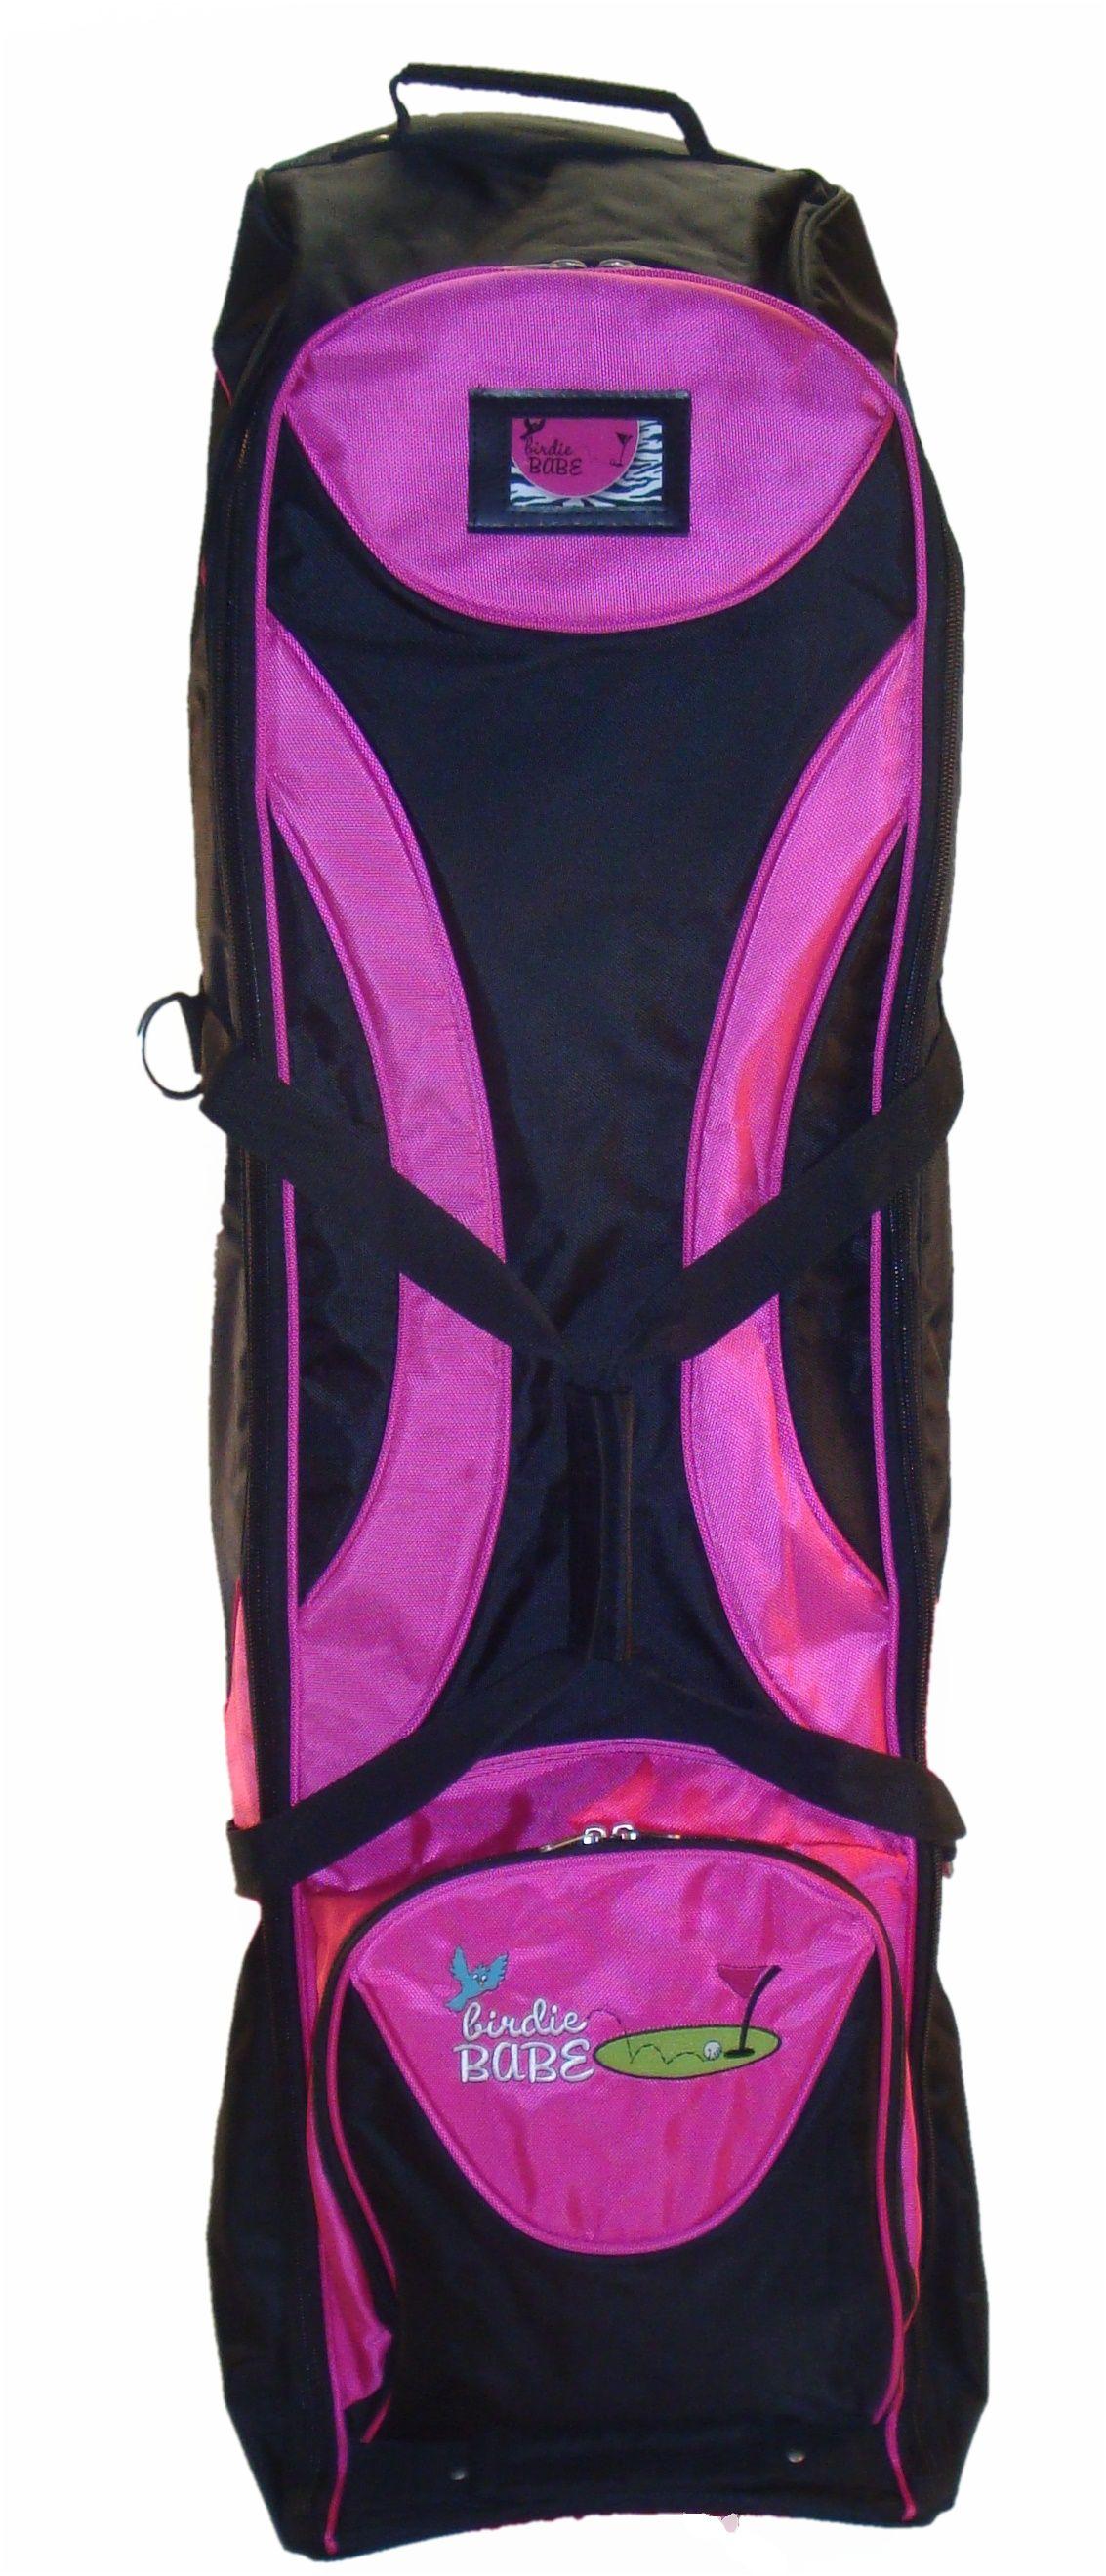 Hot Pink Golf Travel Bag Las Clubs Bags